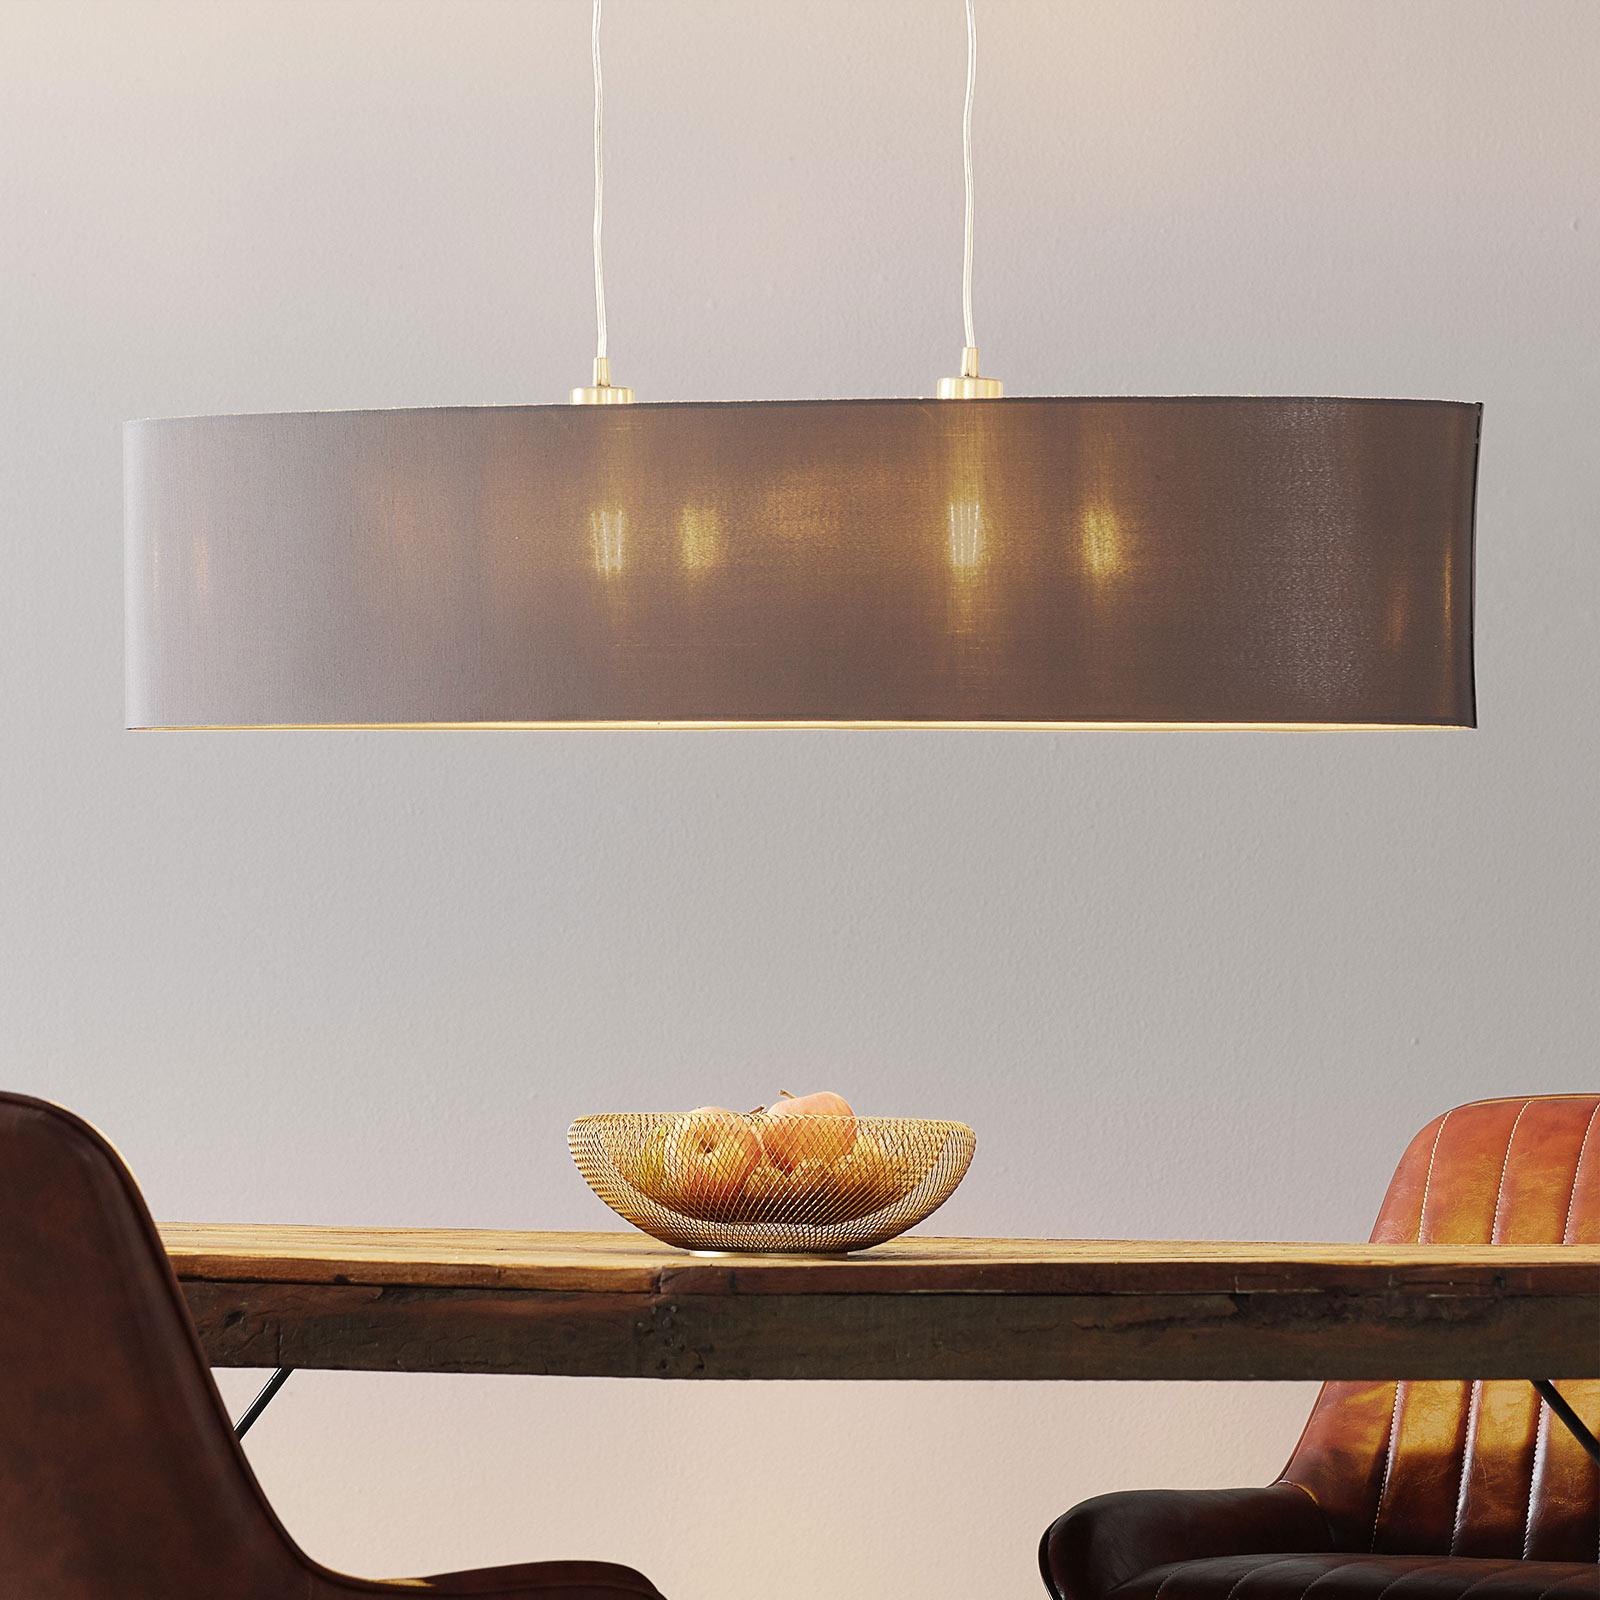 Stoffen hanglamp Maserlo, ovaal, cappuccino 100 cm